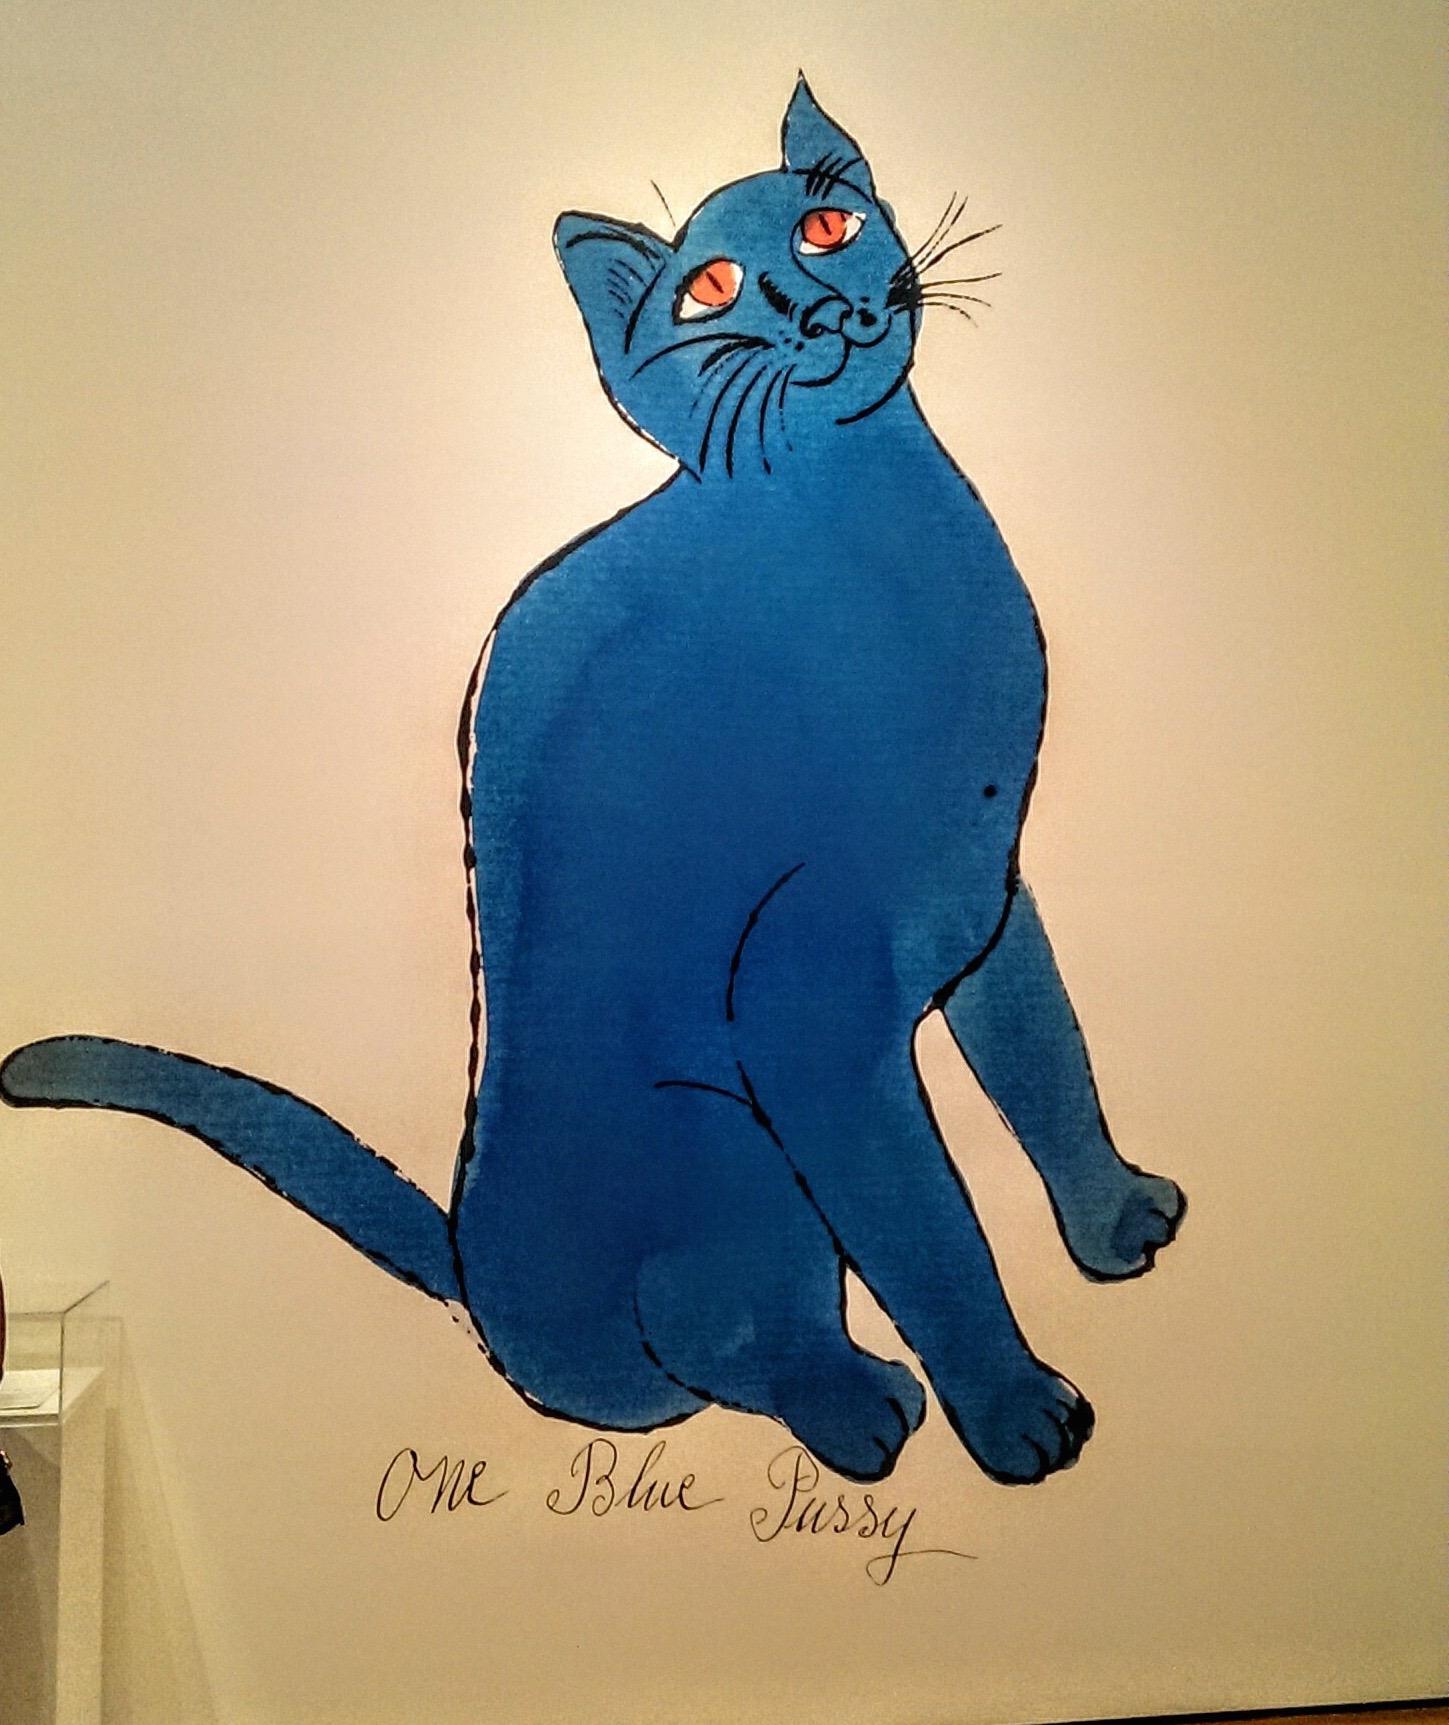 Andy Warhol One Blue Pussy